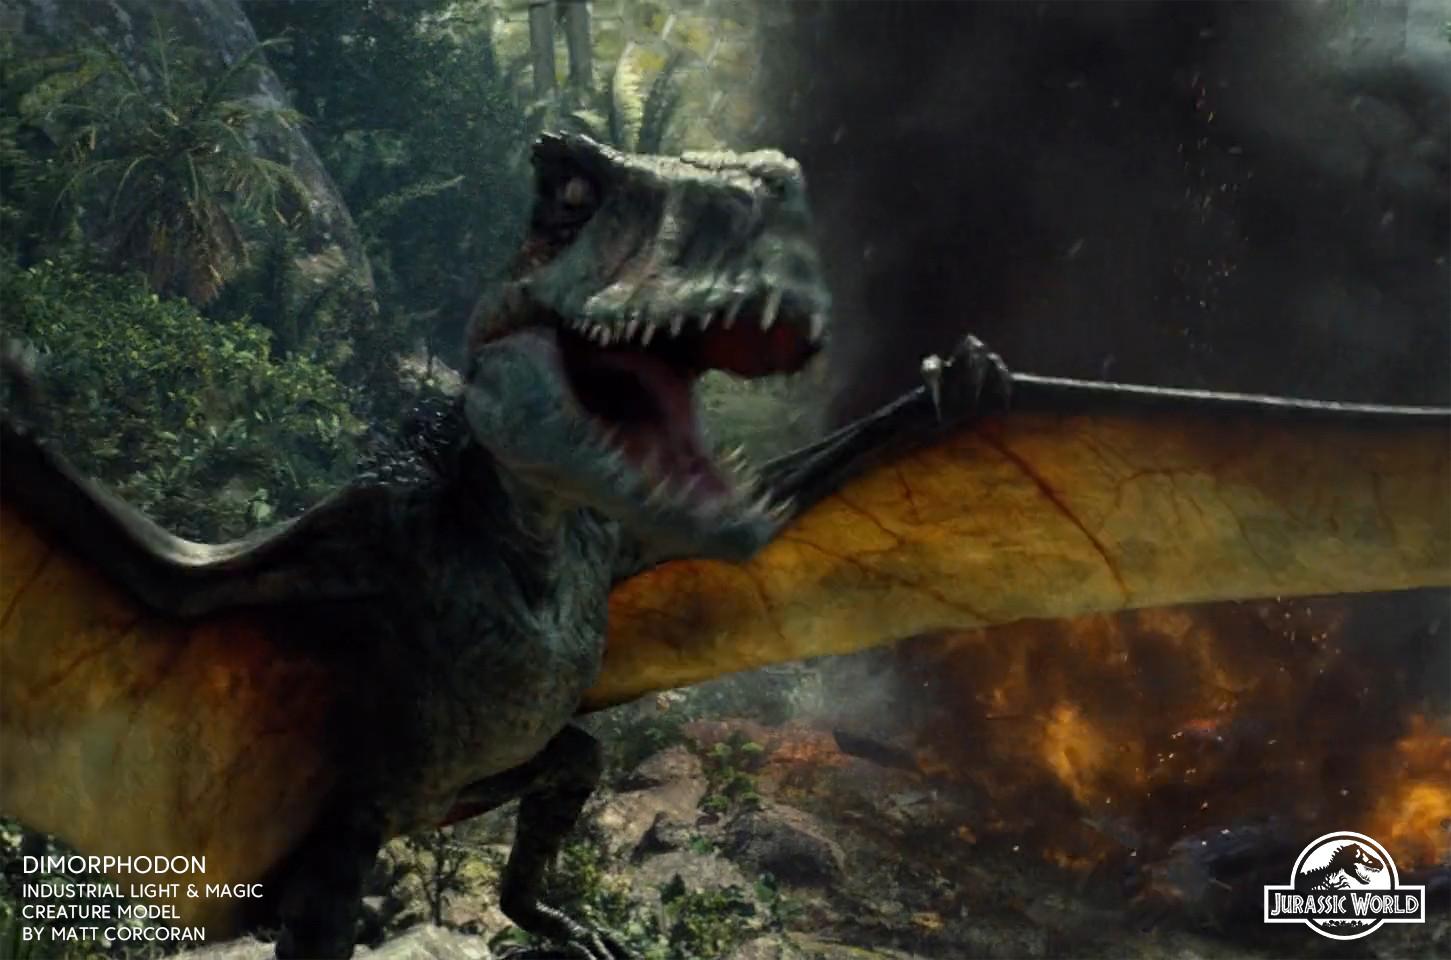 Matt corcoran jurassicworld dimorphodon 01